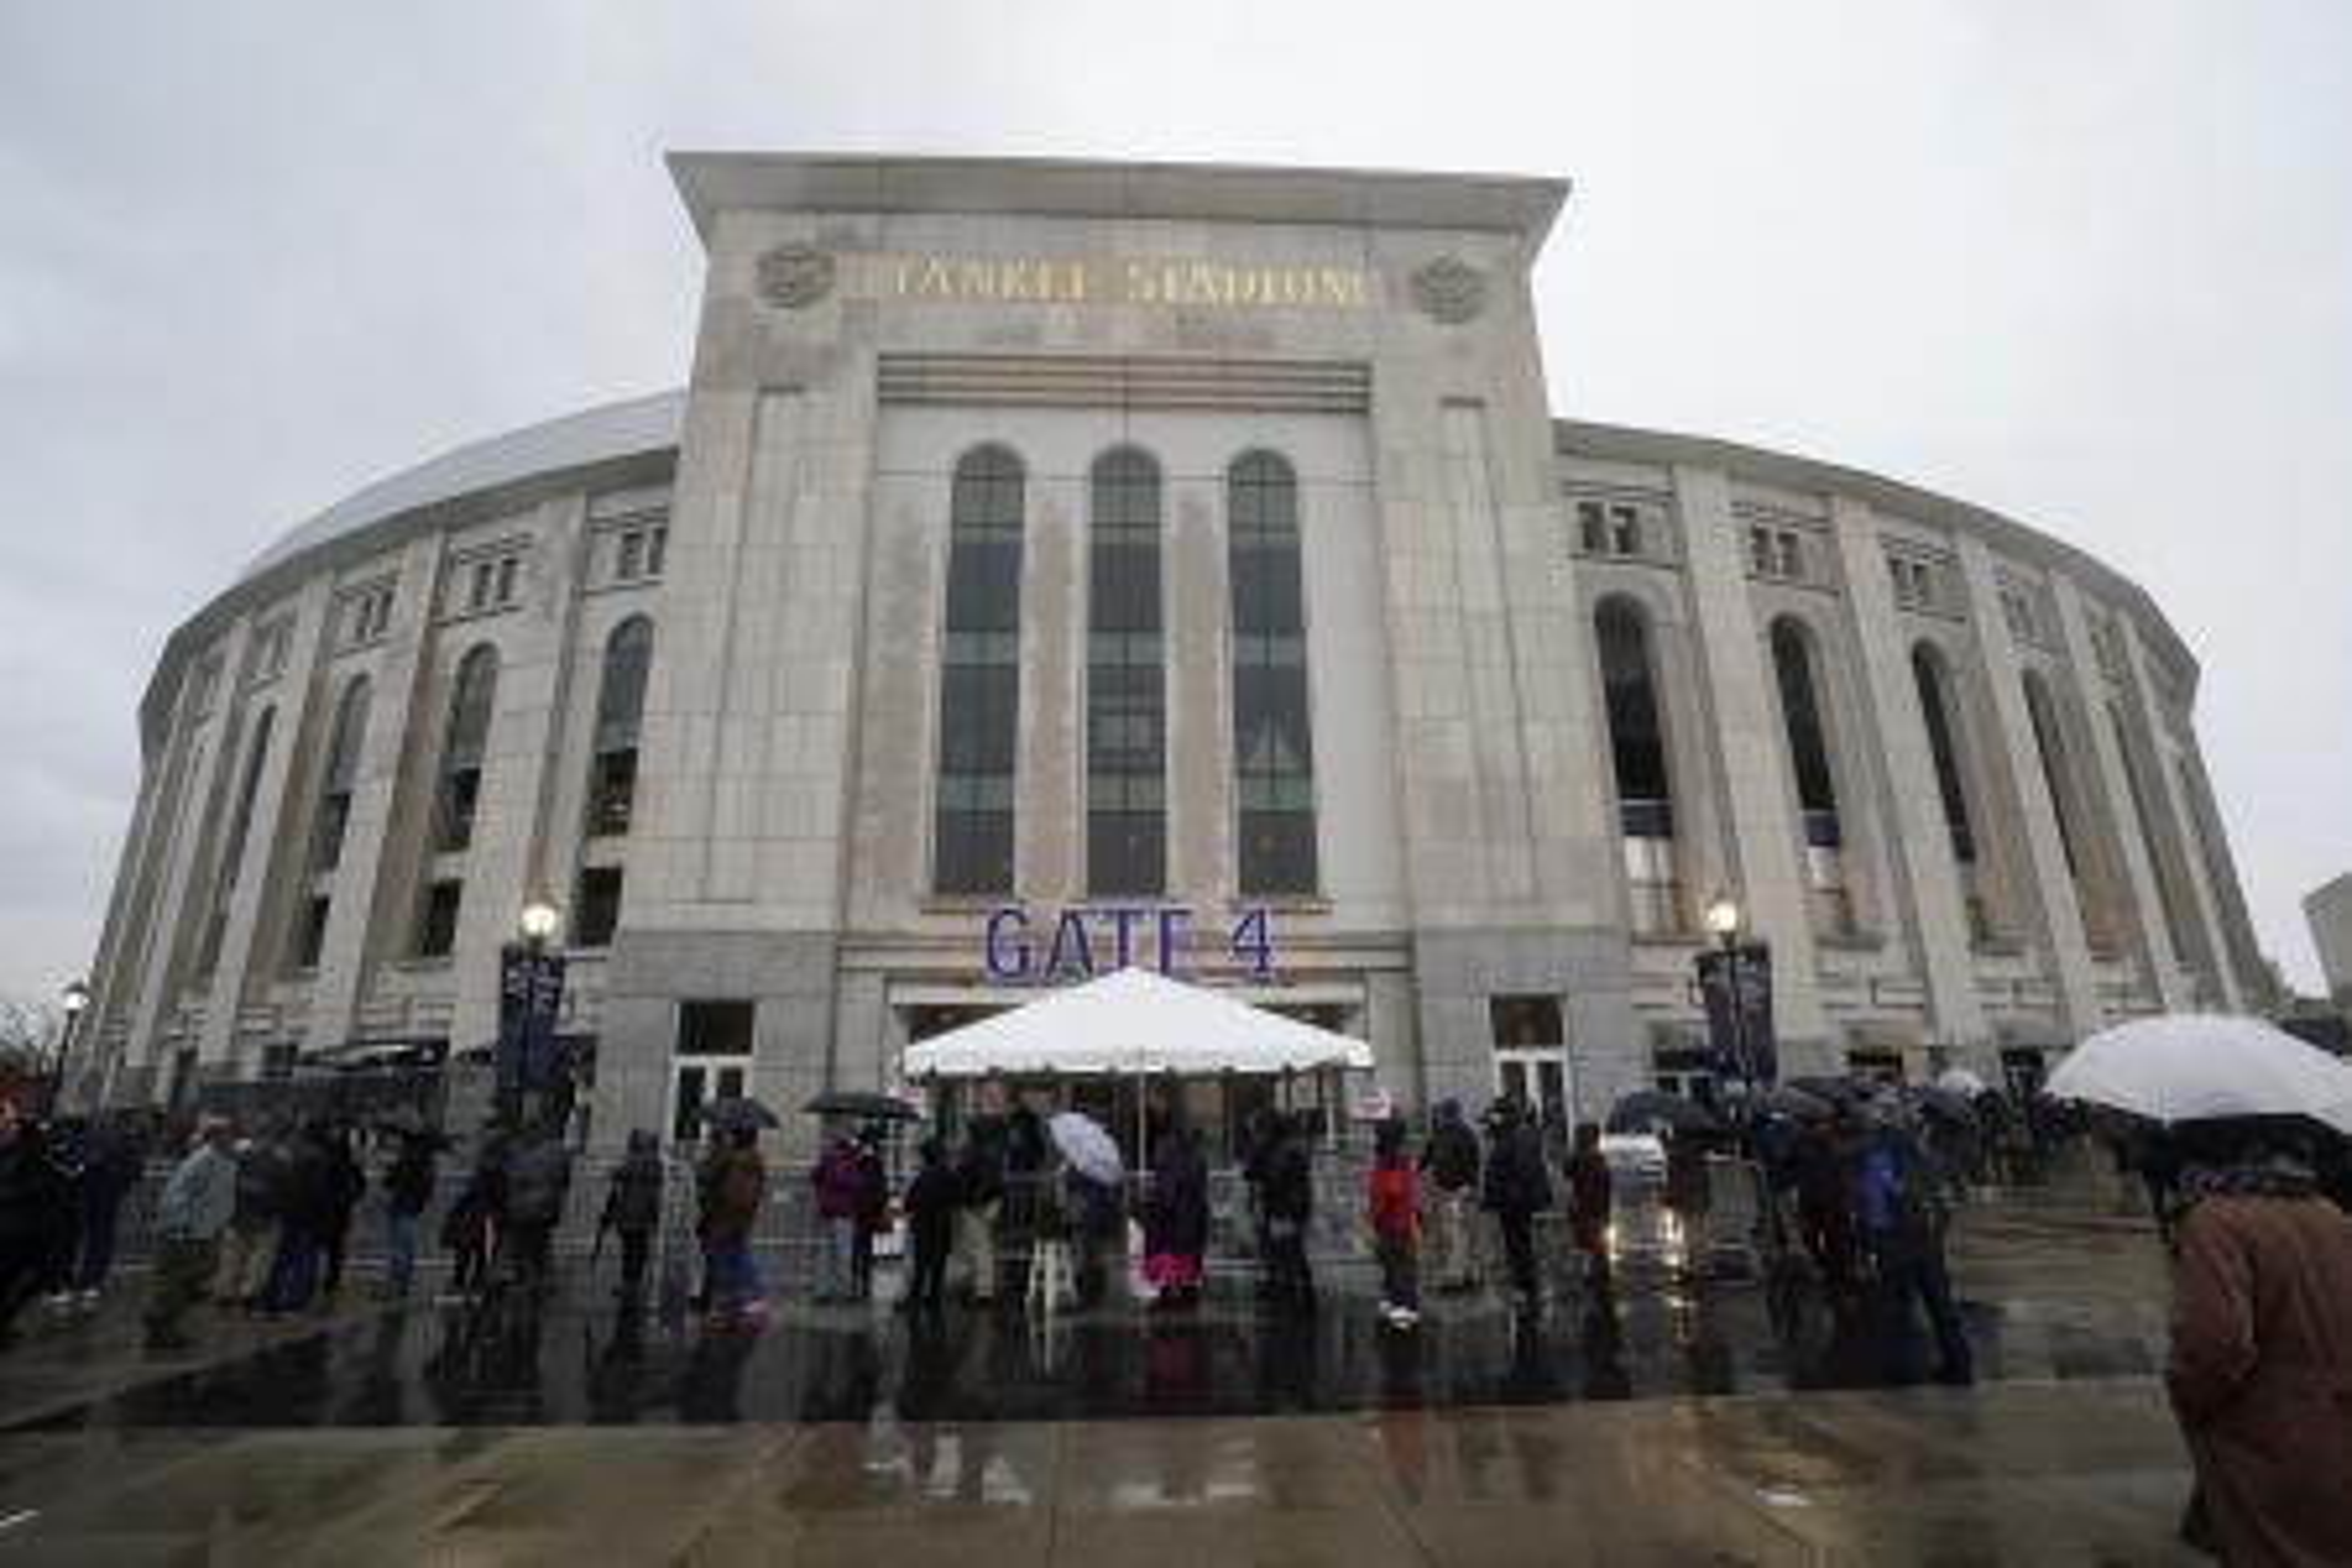 Yankee Stadium, Nova York, EUA